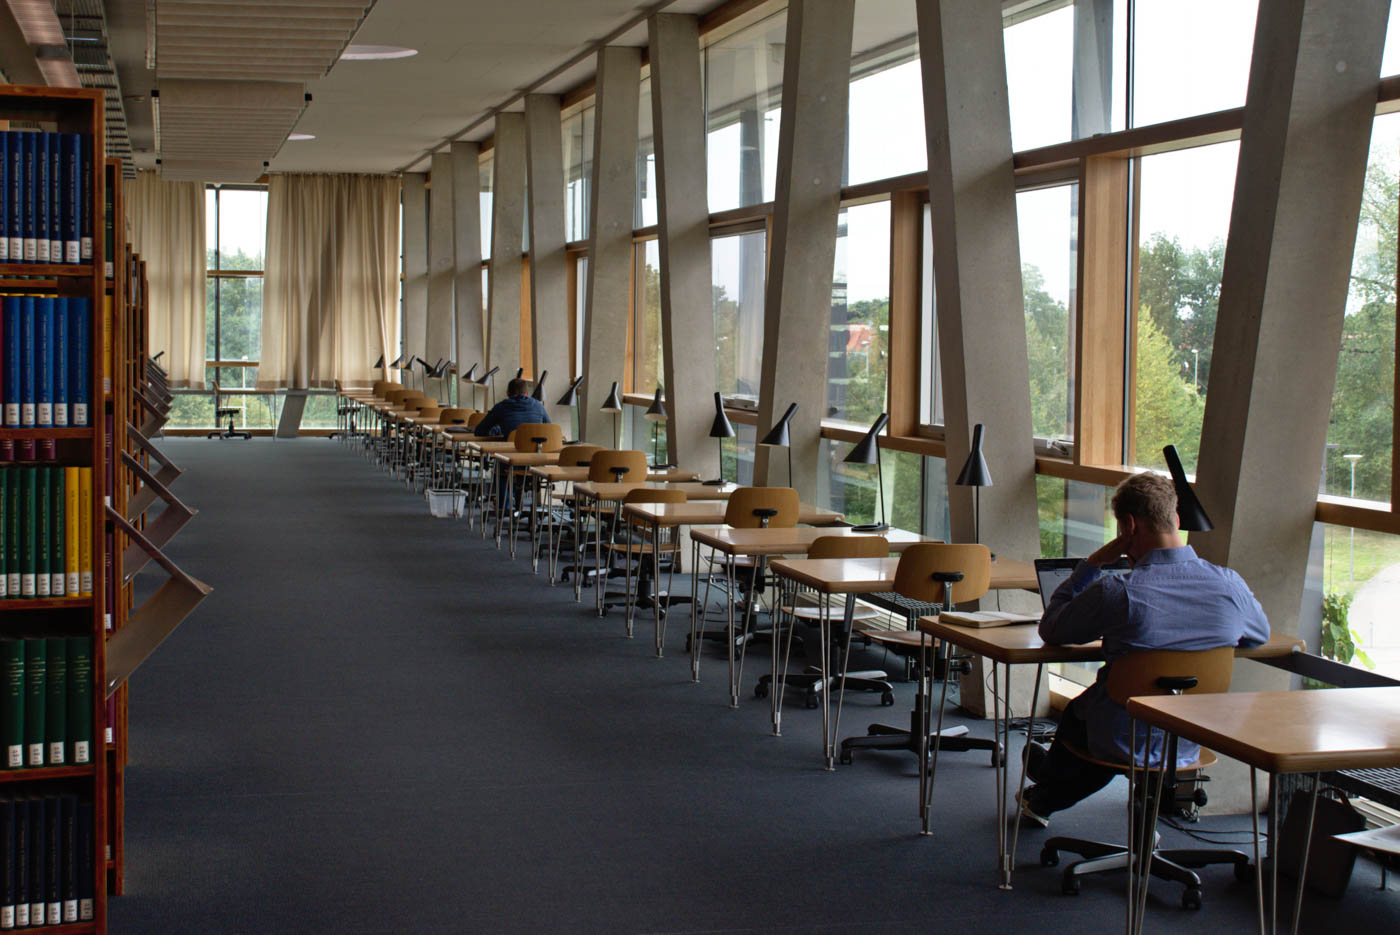 Lernende in der Bibliothek der TF